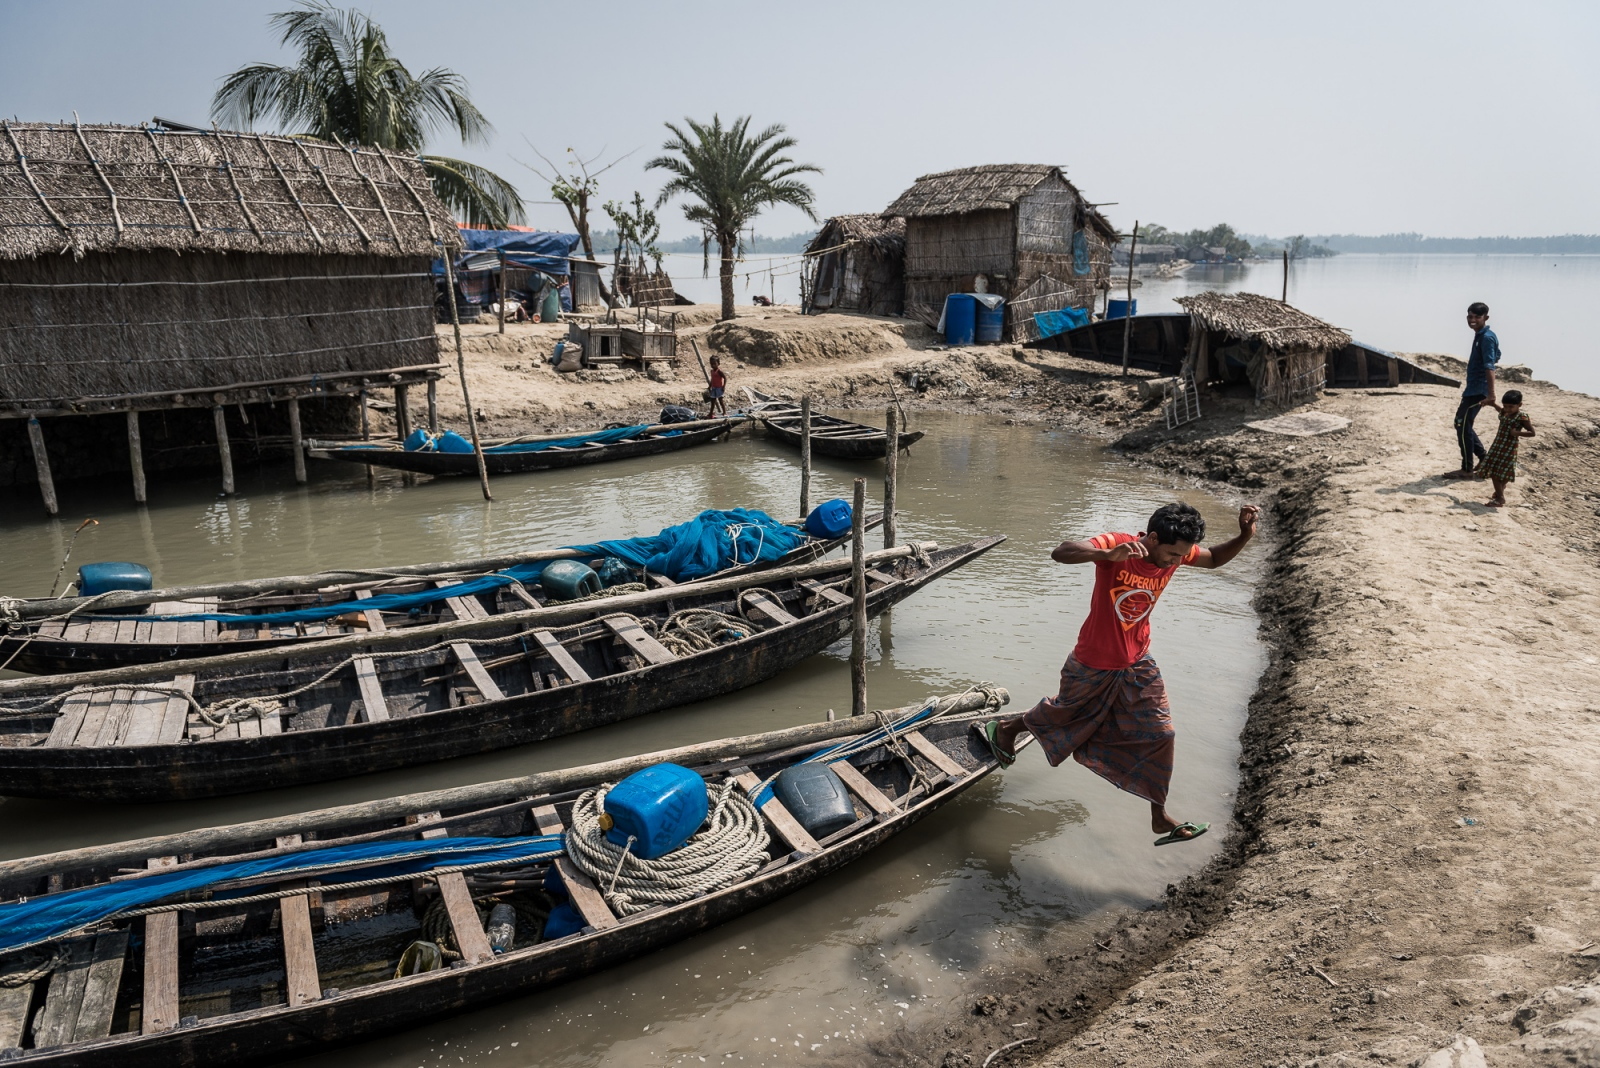 Art and Documentary Photography - Loading Climate_changed_-_ignacio-marin.com-1.jpg